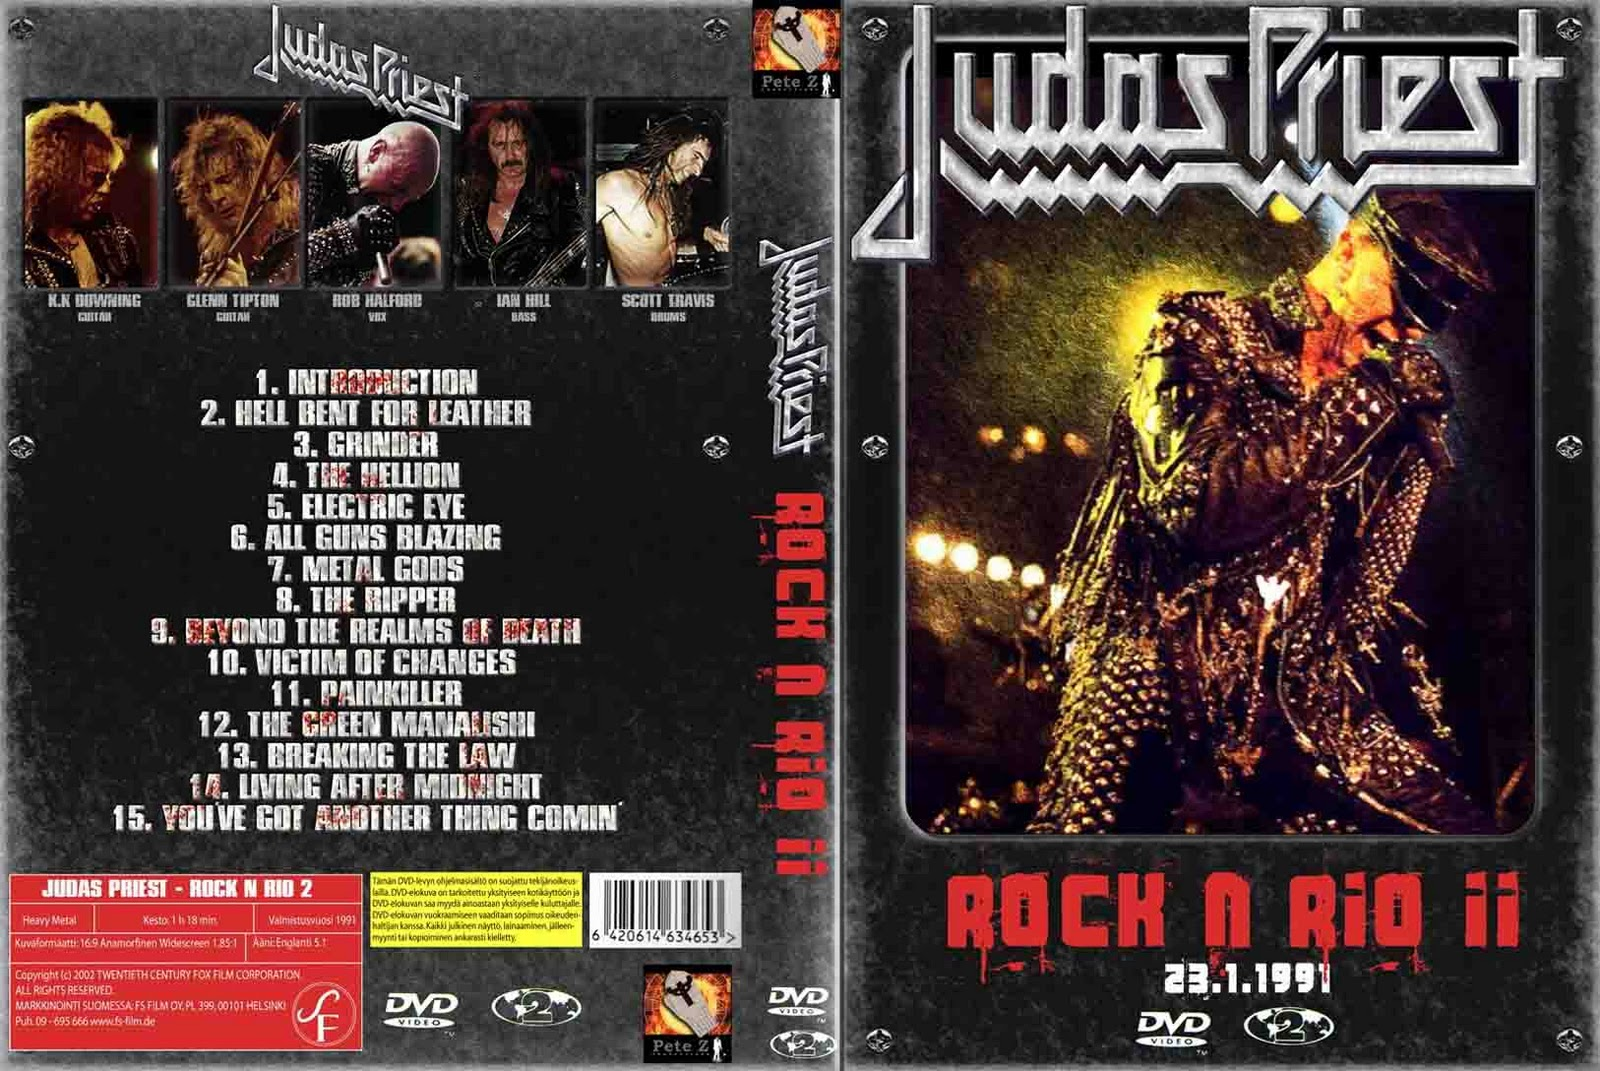 1991. Música - Página 10 DVD+Cover+-+Judas+Priest+-+1991-01-23+Rock+in+Rio+II